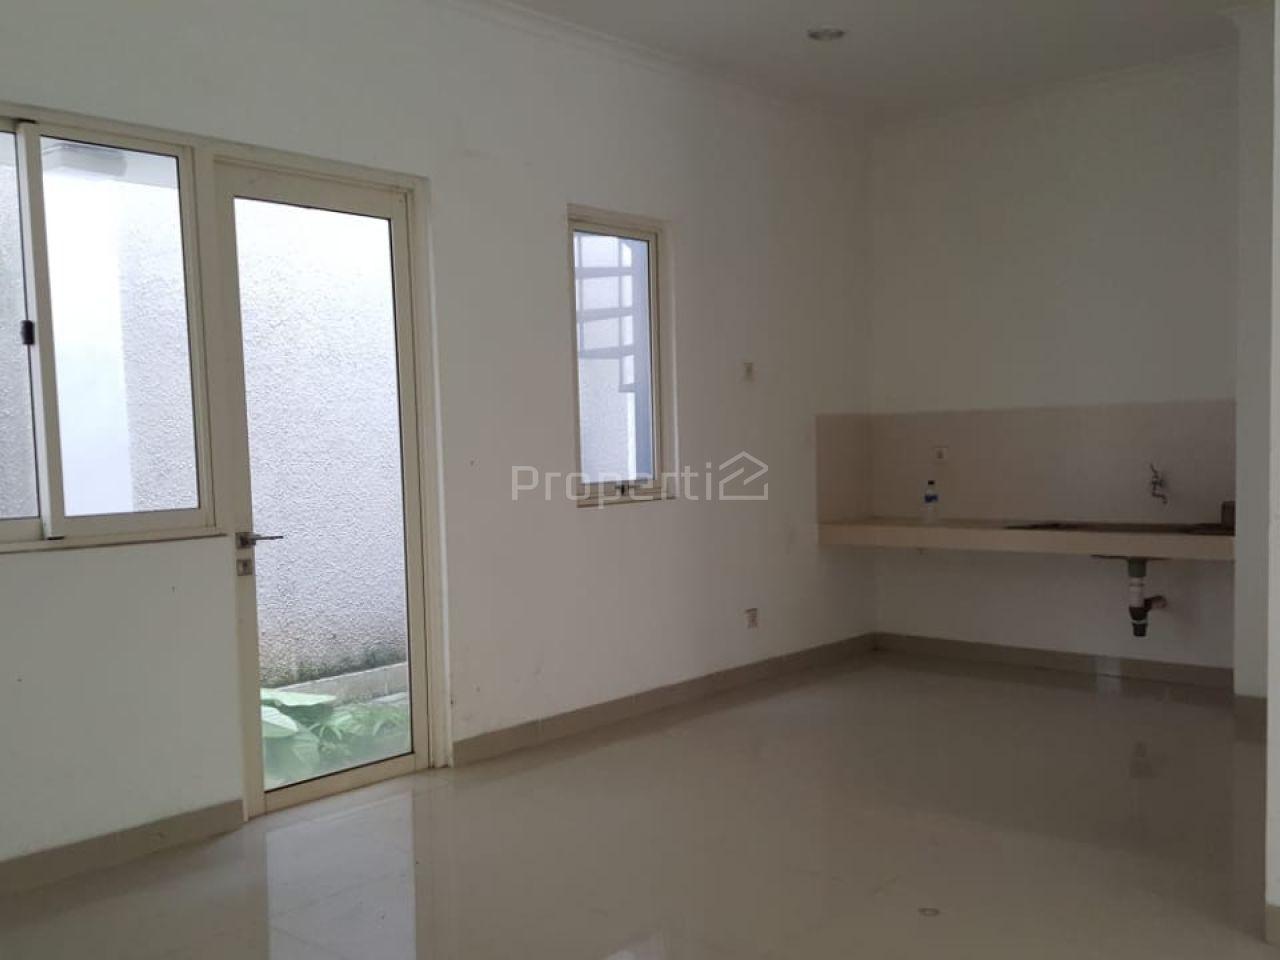 Rumah Baru di Faraday, Gading Serpong, Kab. Tangerang